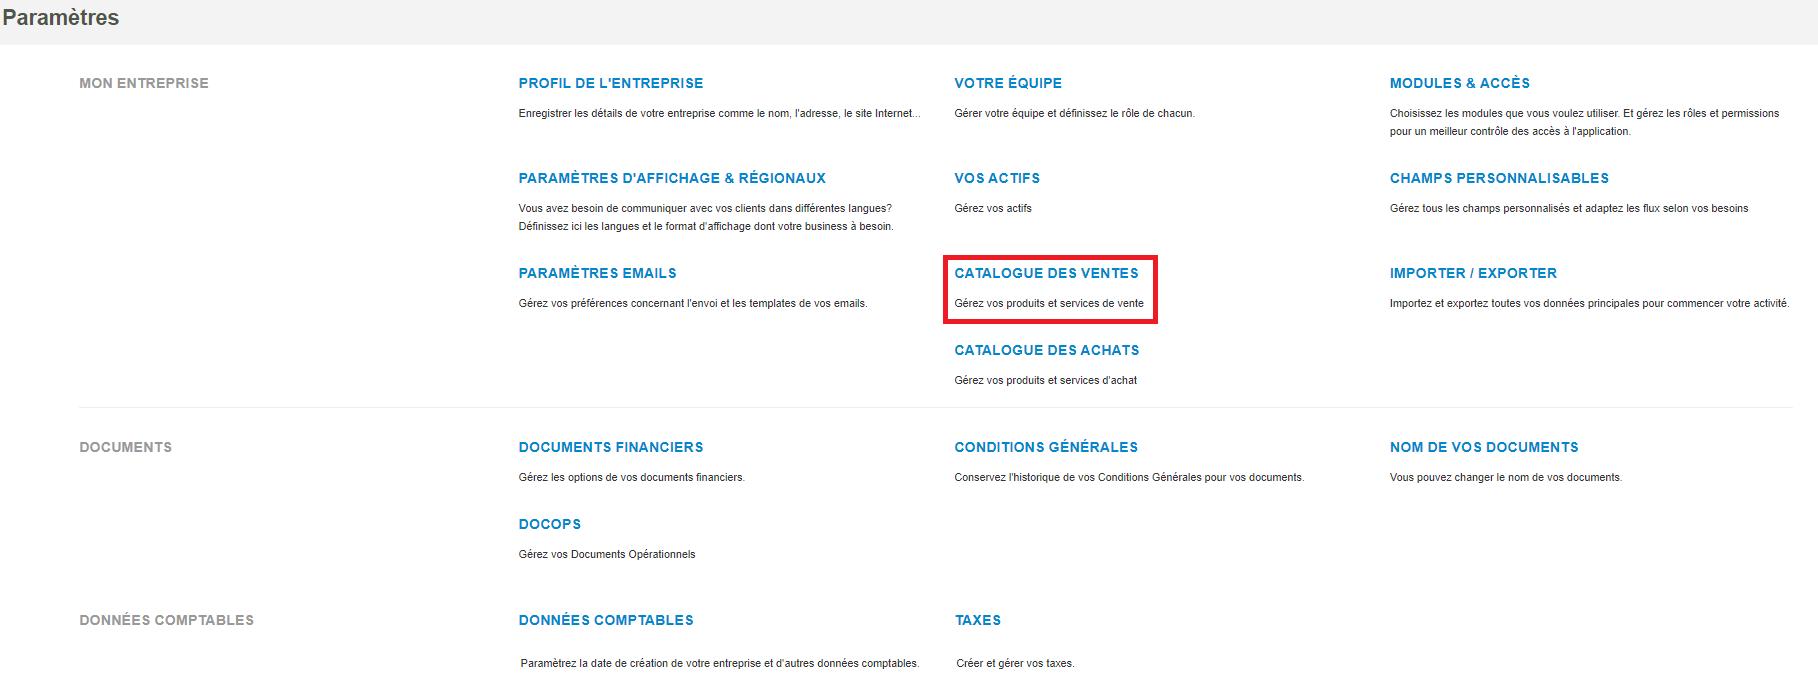 Smoall - paramètres-création catalogue des ventes